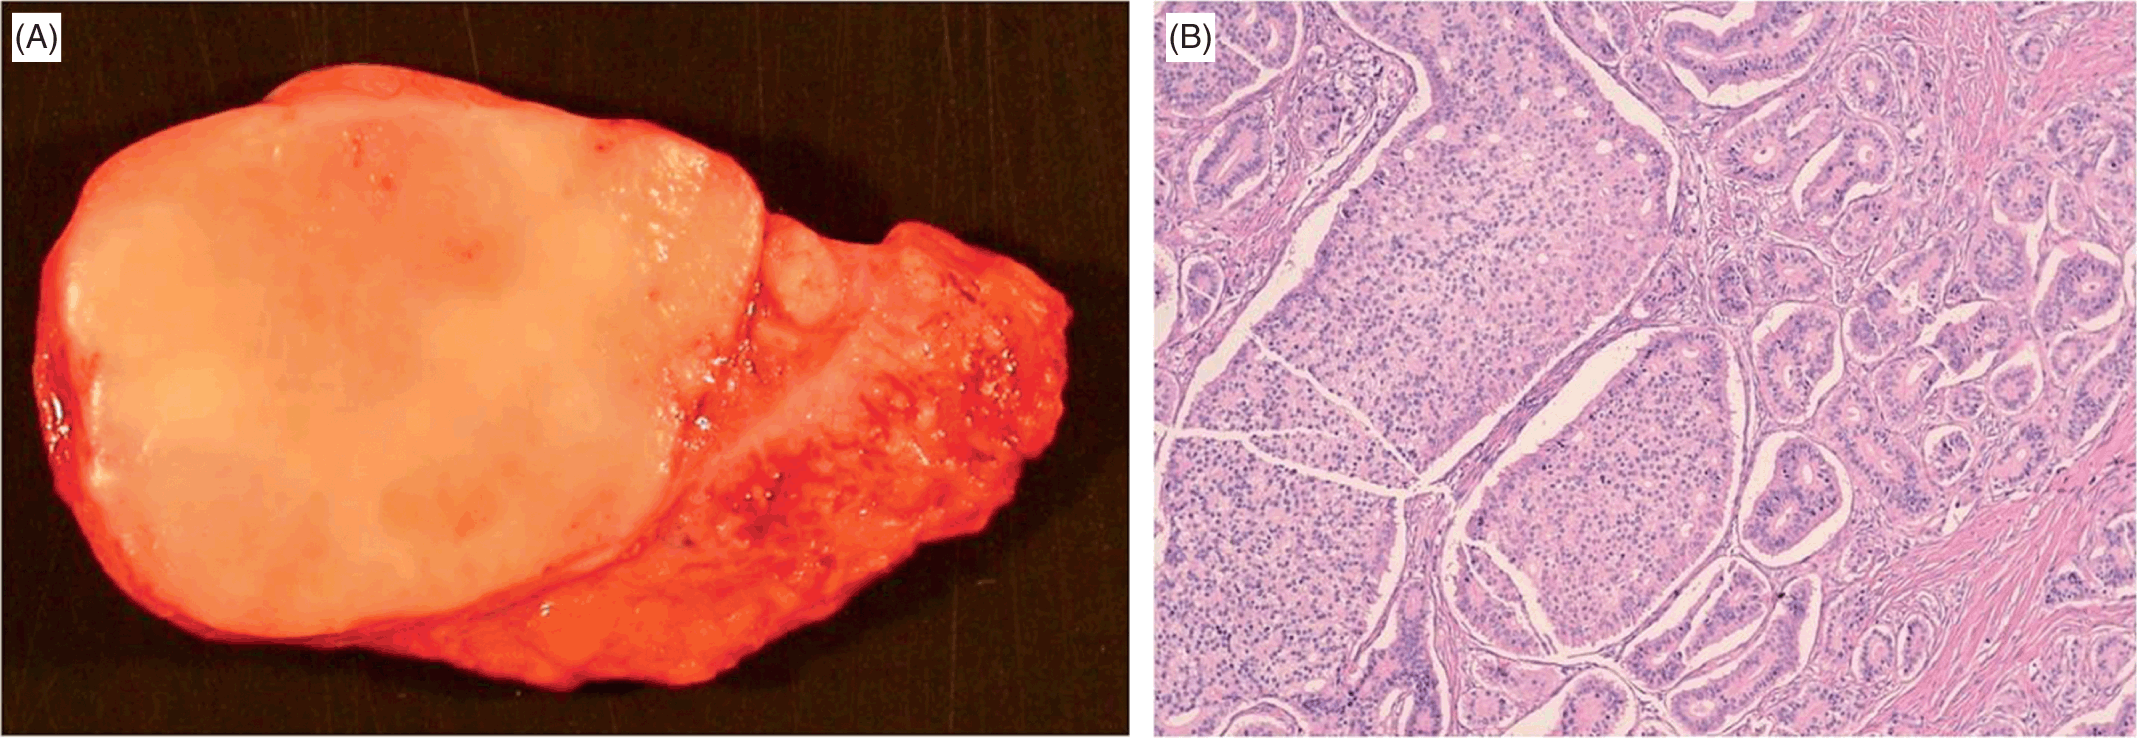 Neuroendocrine Tumors (Section 5) - Gynecologic and Urologic